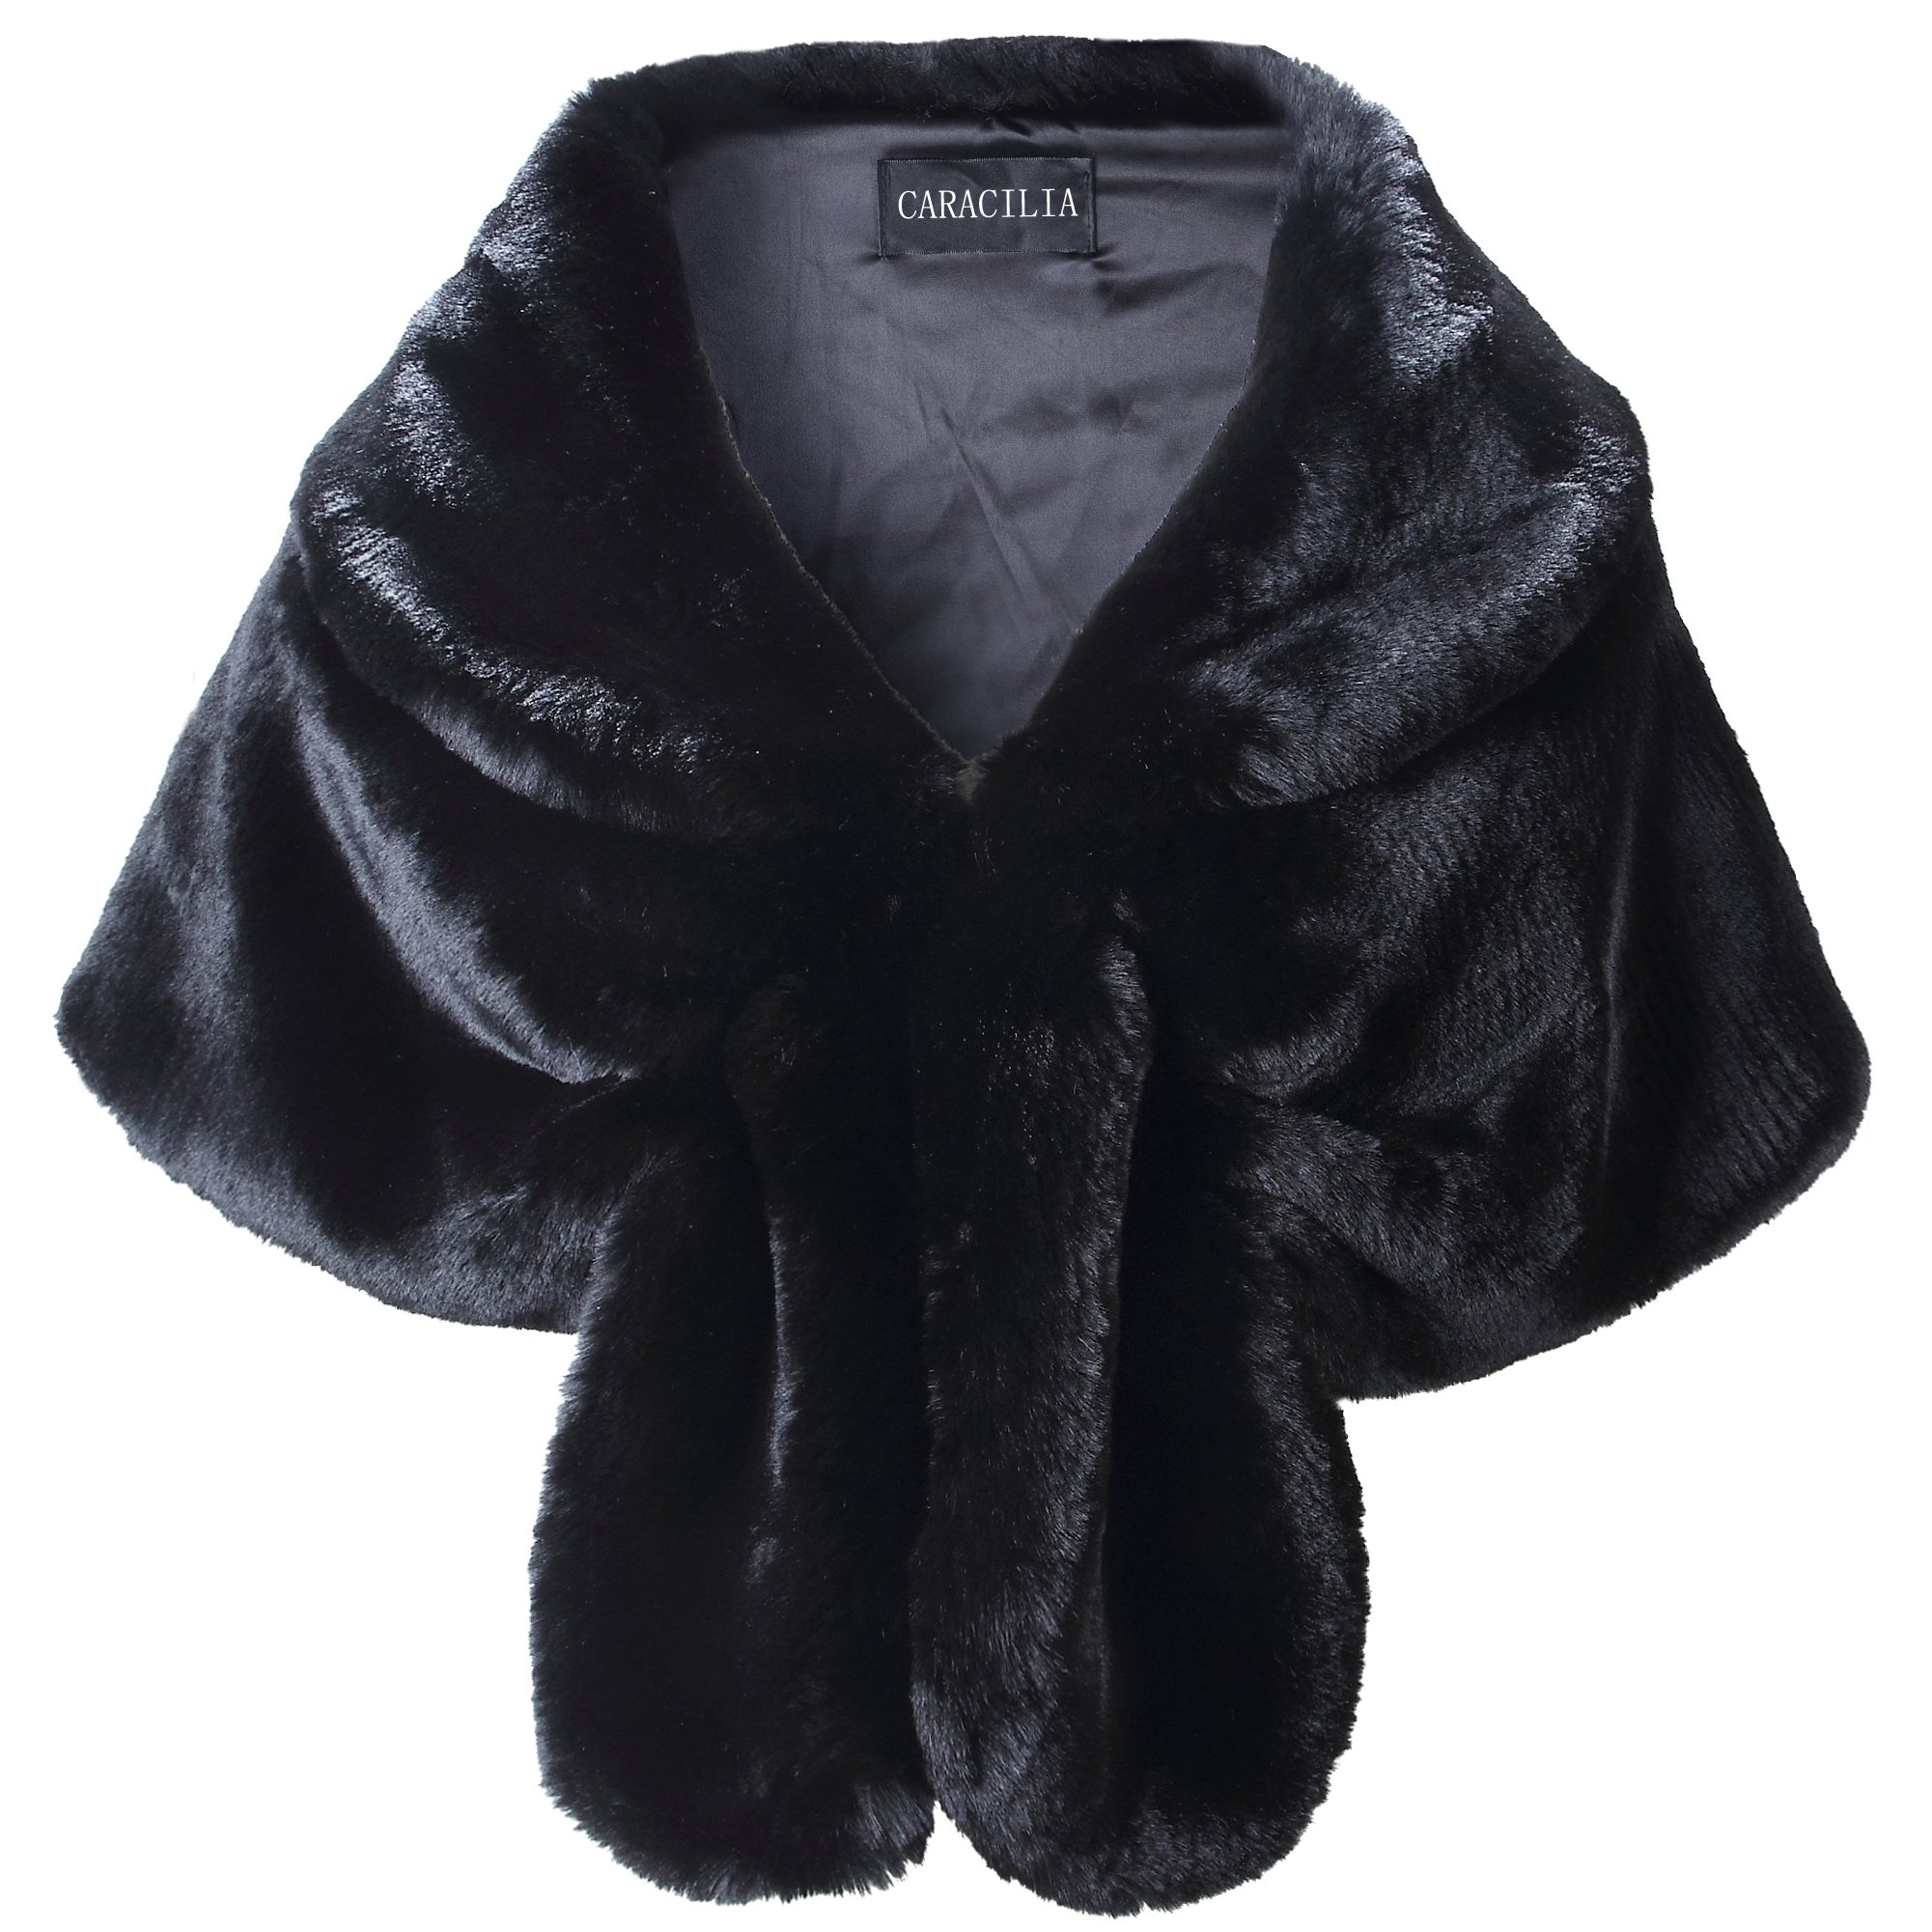 Caracilia Women Faux Fur Shawl Wrap Stole Shrug Winter Wedding Wrap Black S CA95